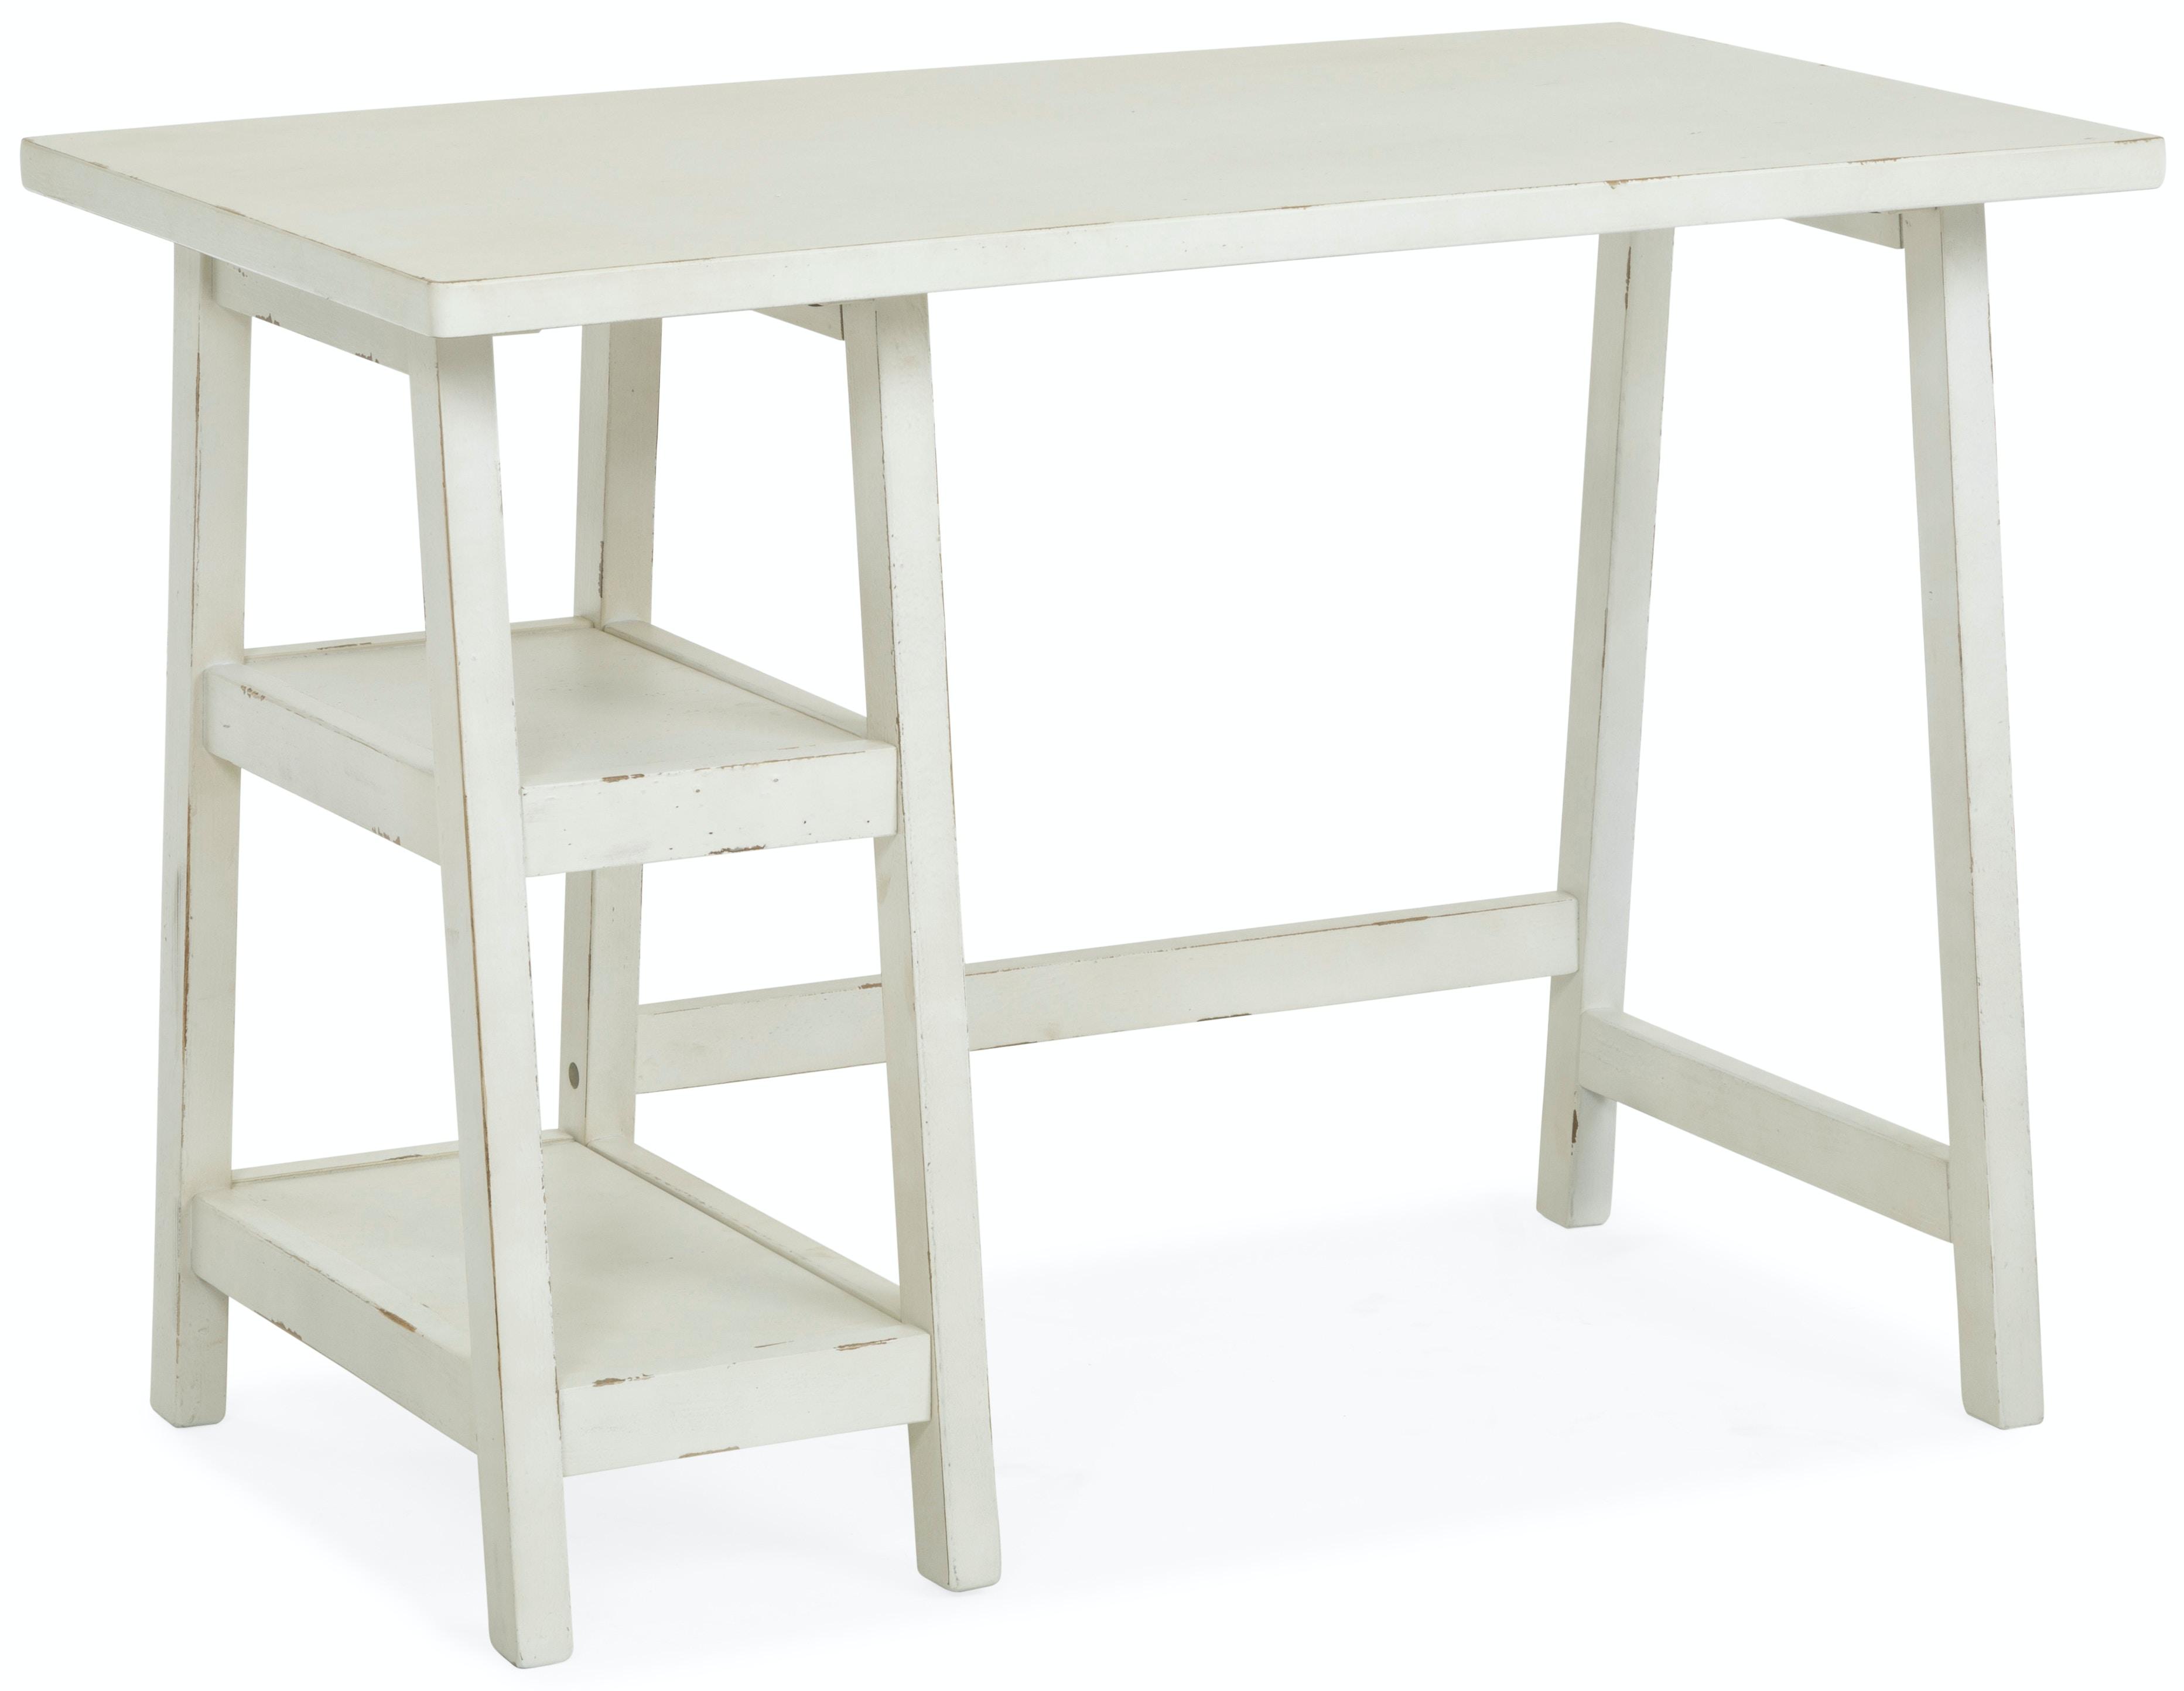 Merveilleux LaCross Desk   White ST:504683